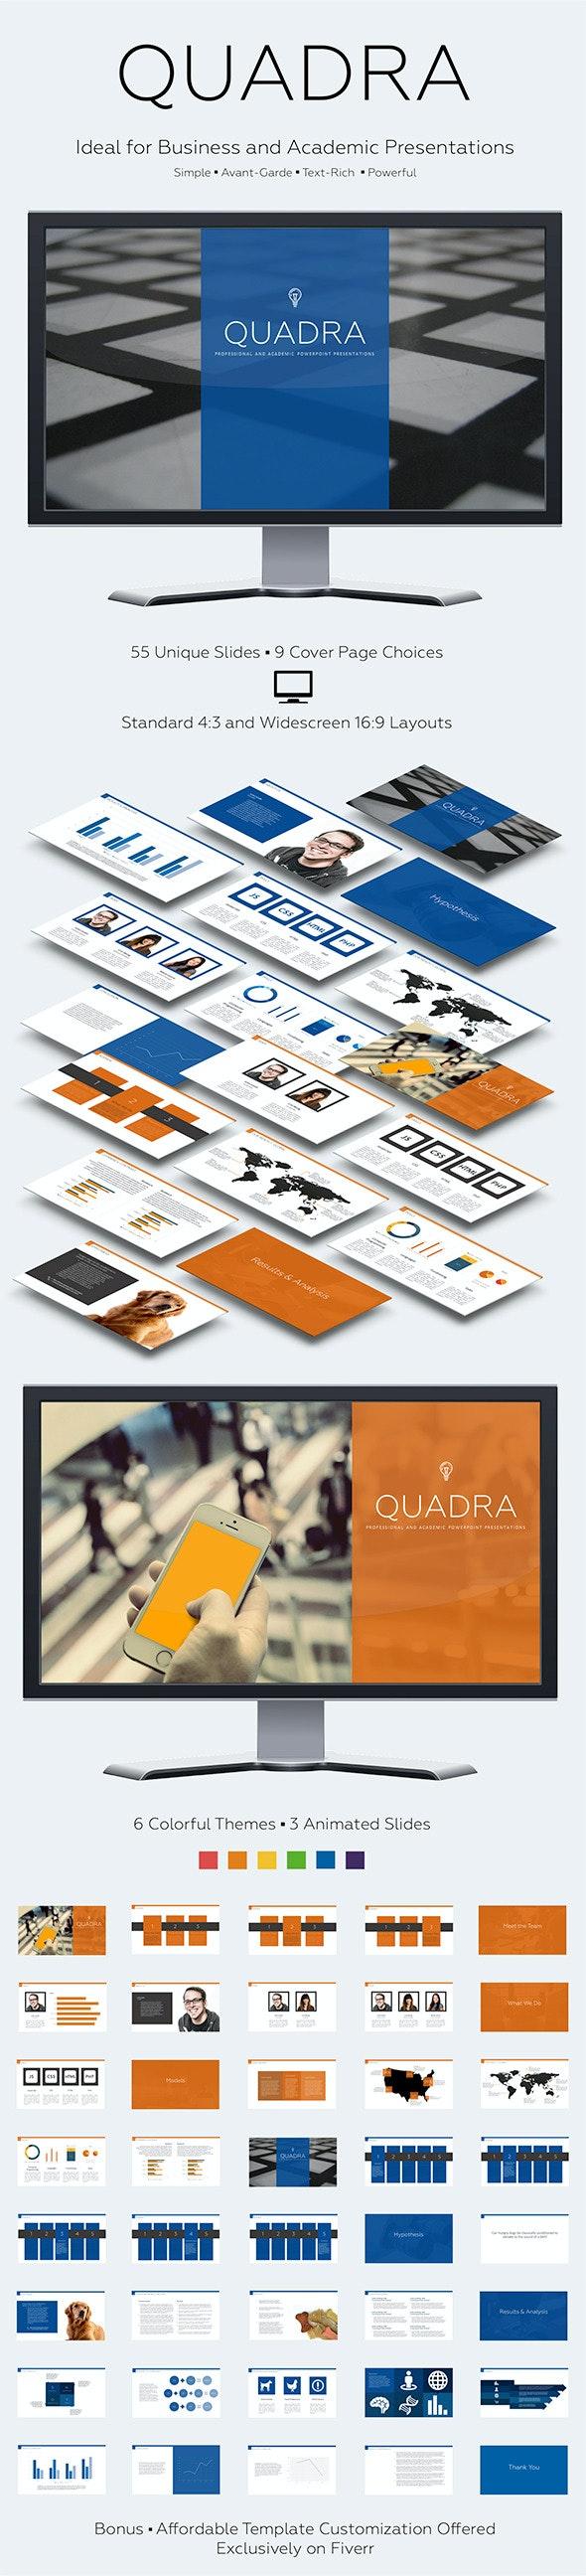 Quadra - PowerPoint Templates Presentation Templates